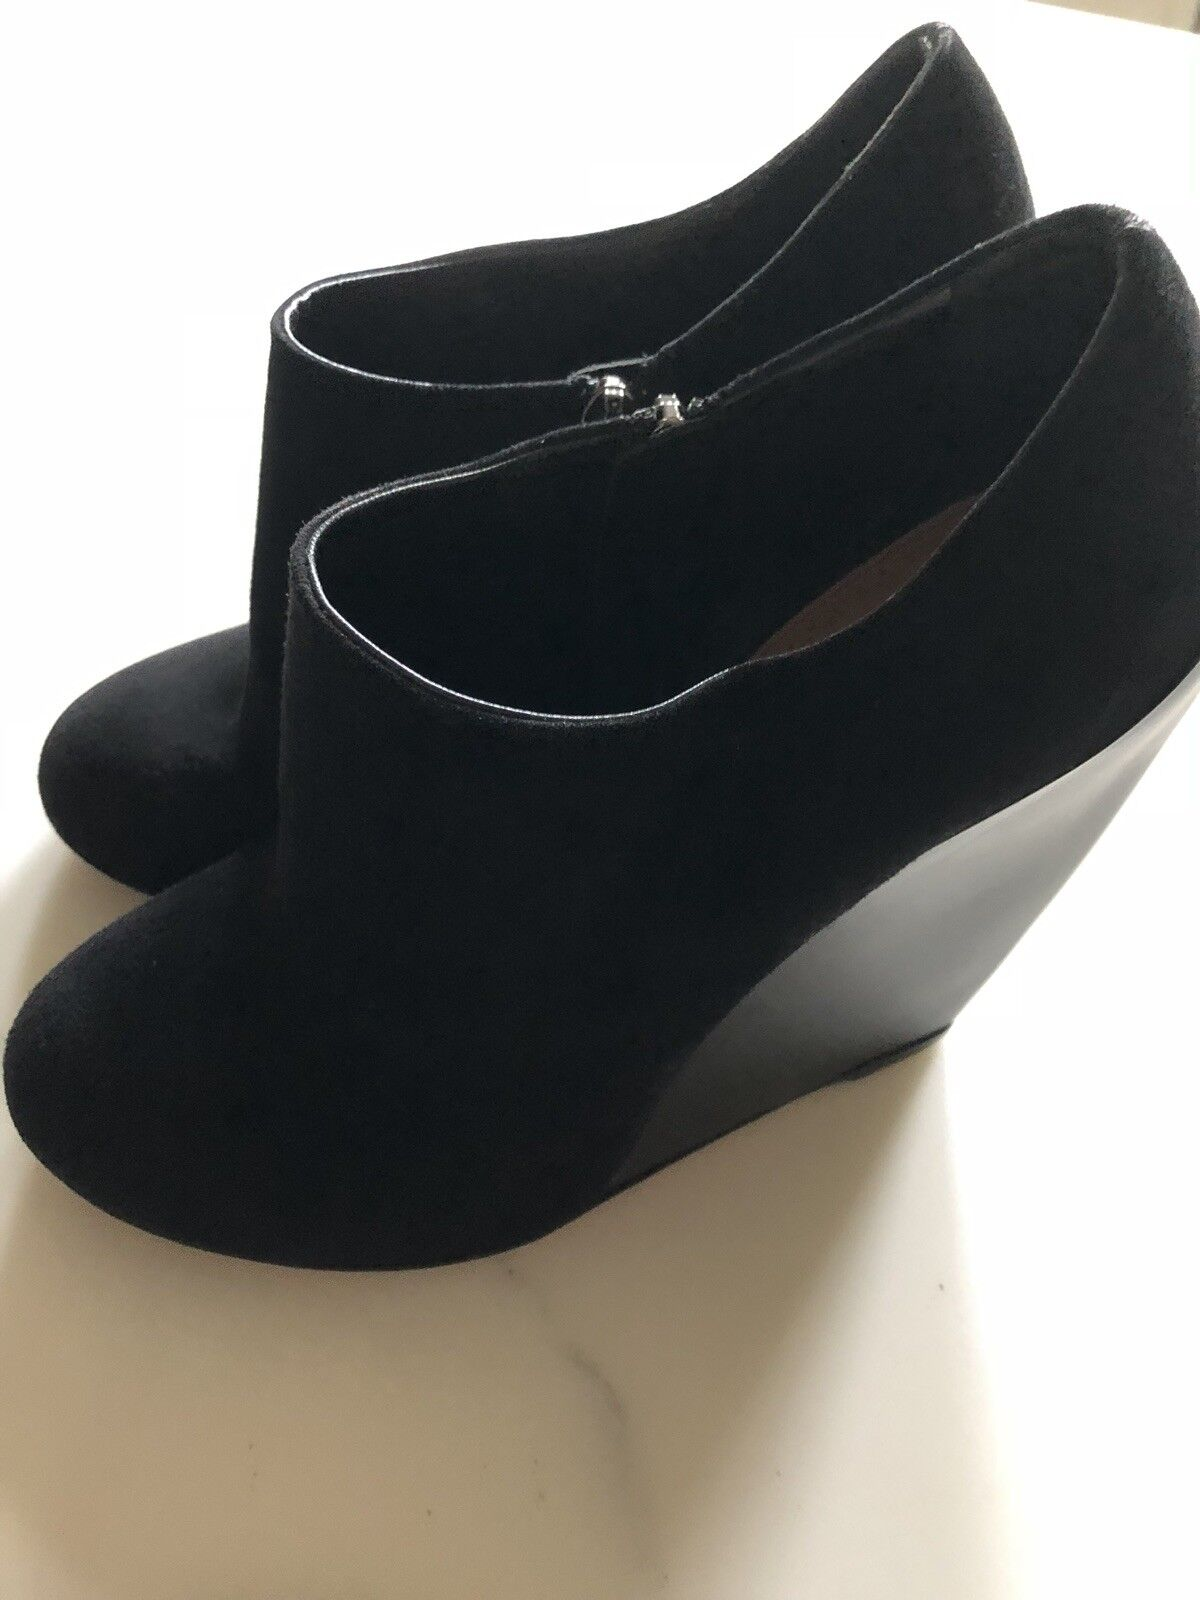 Rare Rare Rare Alaia Black Leather Zip Up High Wedge Heel Booties 39 Barney's  1500 74d657